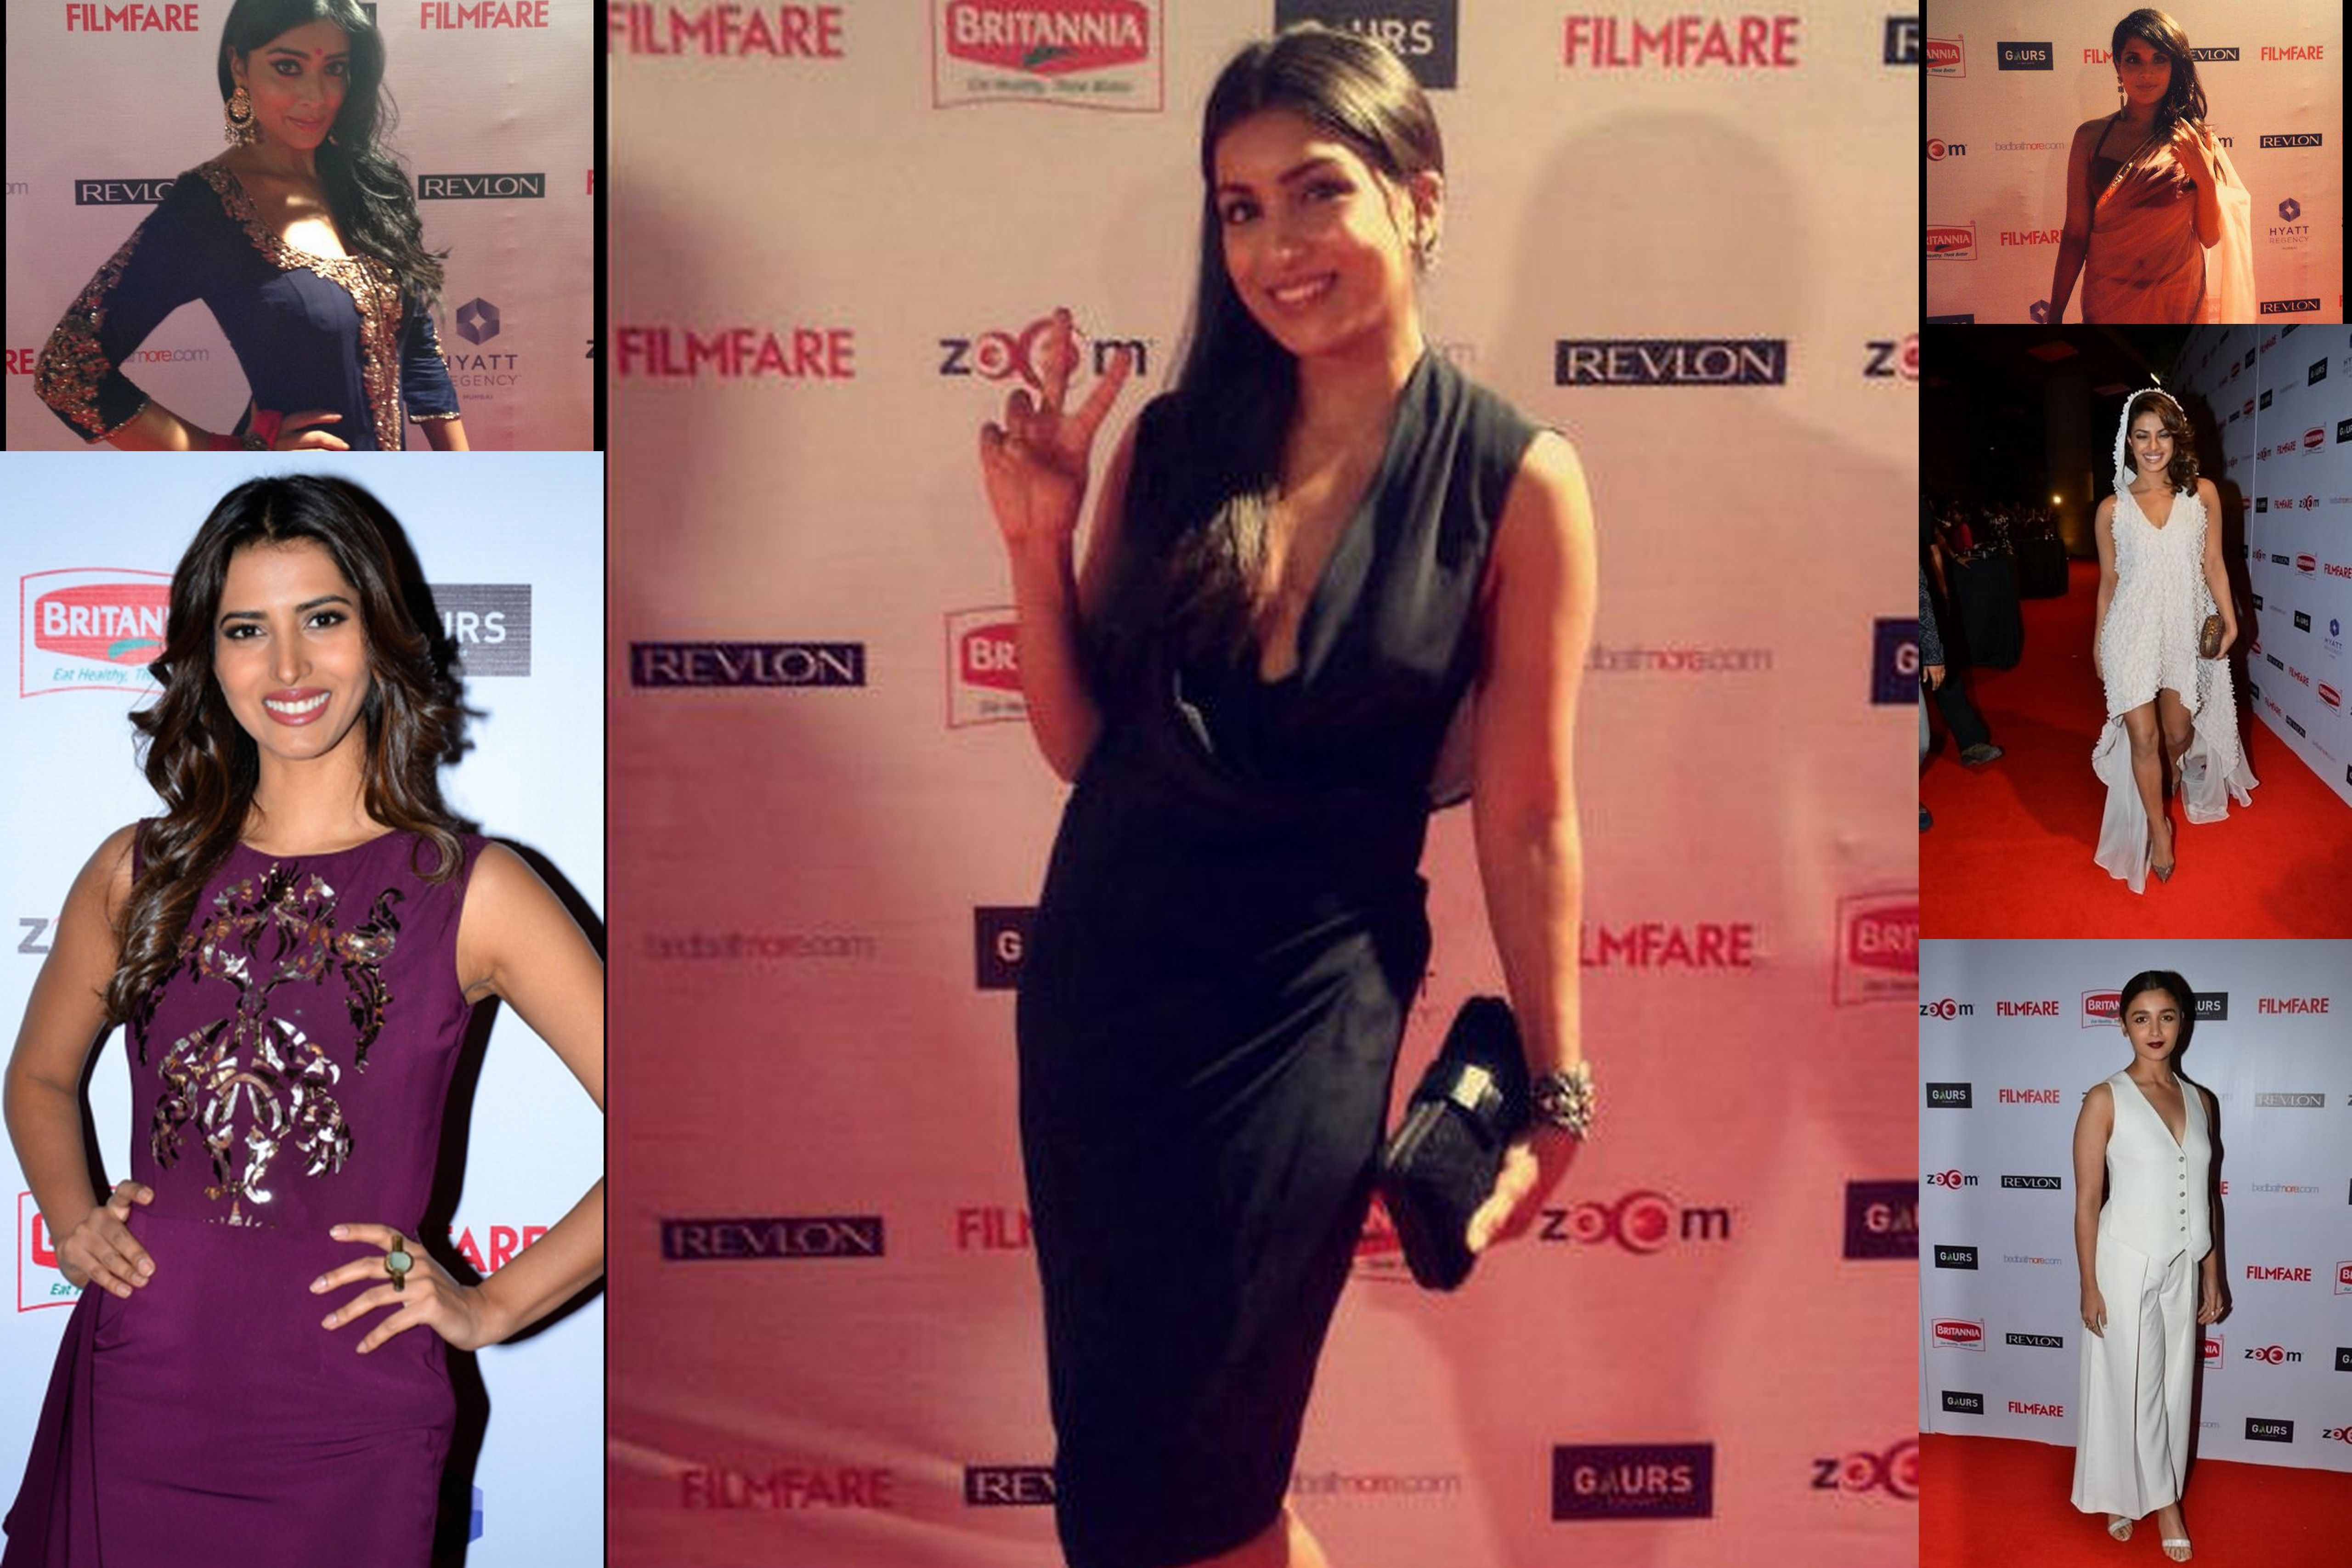 Bollywood Celebs At The Filmfare Pre-Award Night 2014